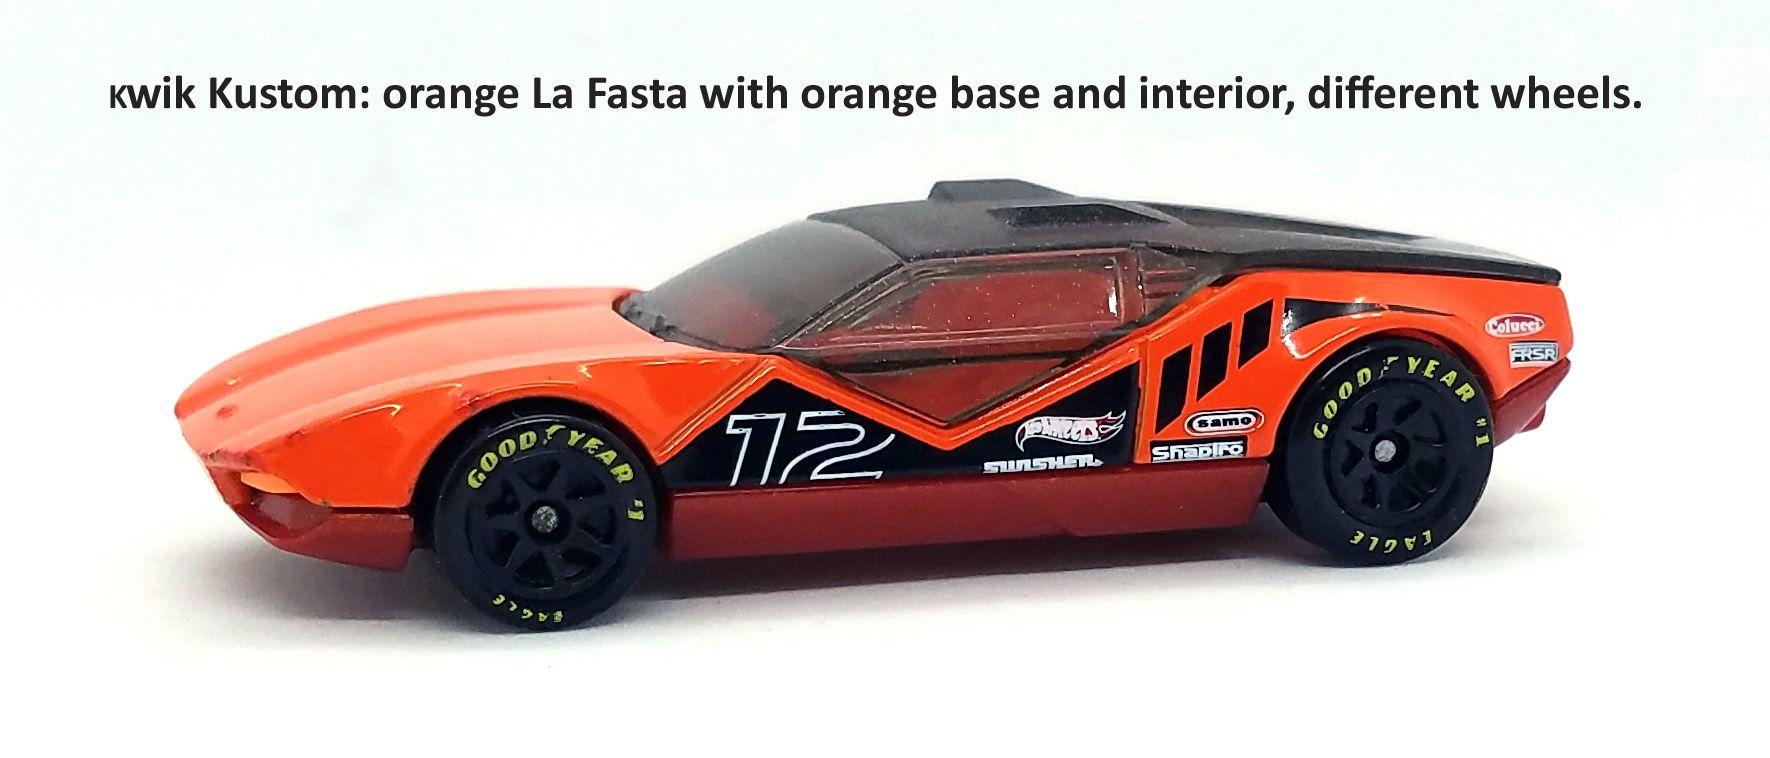 Orange La Fasta Kwik Kustom Hot Wheels Toy Car Pantera [ 758 x 1770 Pixel ]